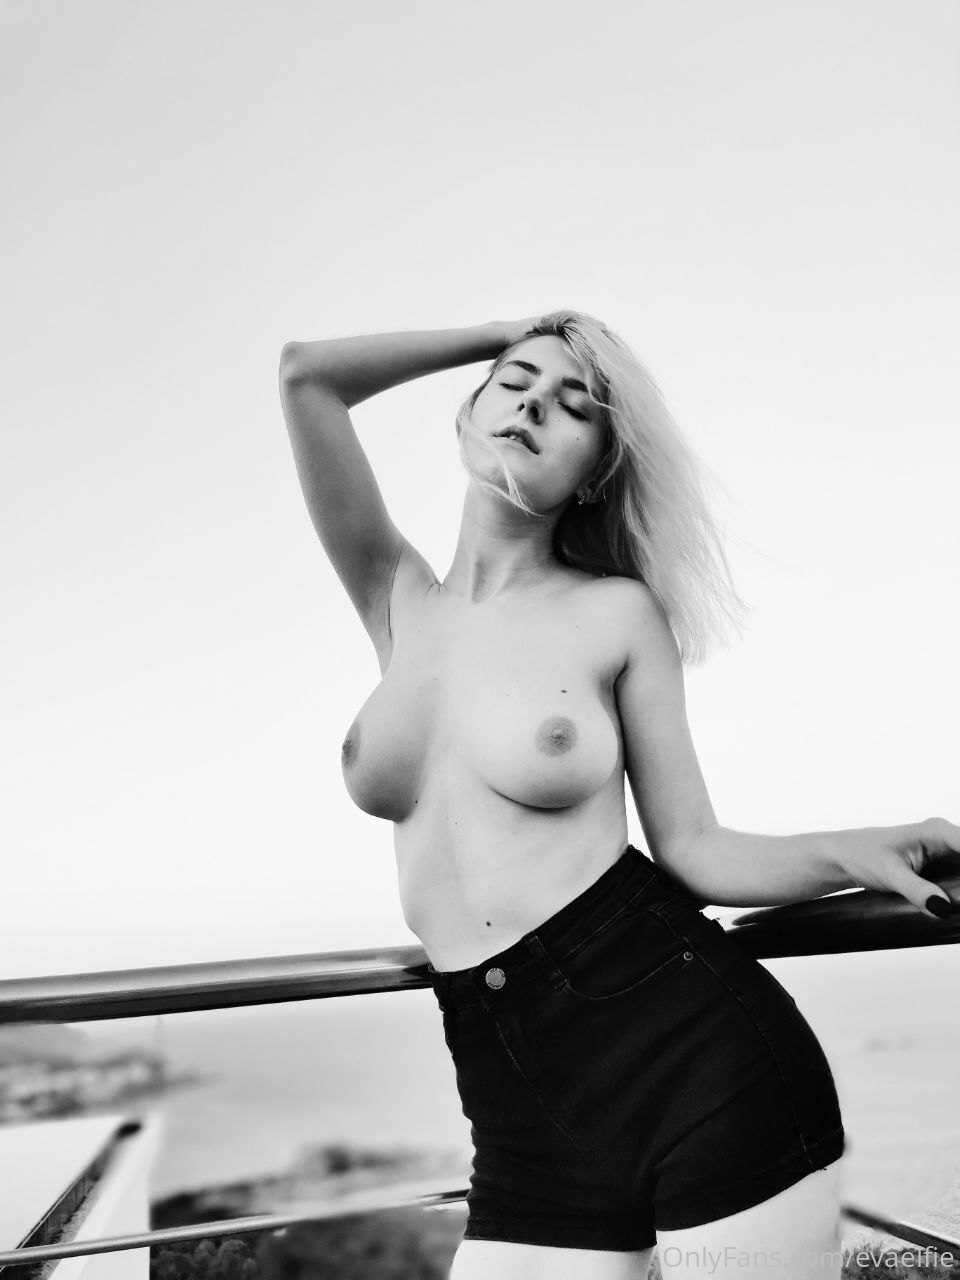 Eva Elfie, Evaelfie, Onlyfans 0017